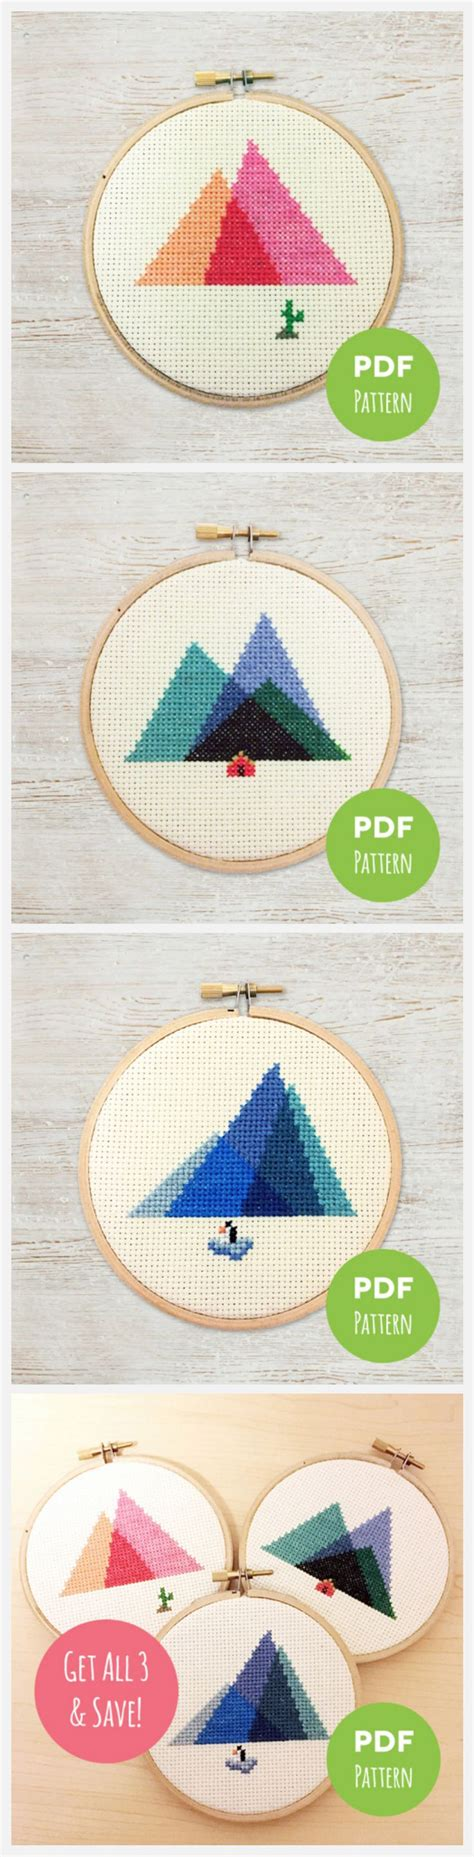 Minimal Embroidery Tunic best 25 modern patterns ideas on modern